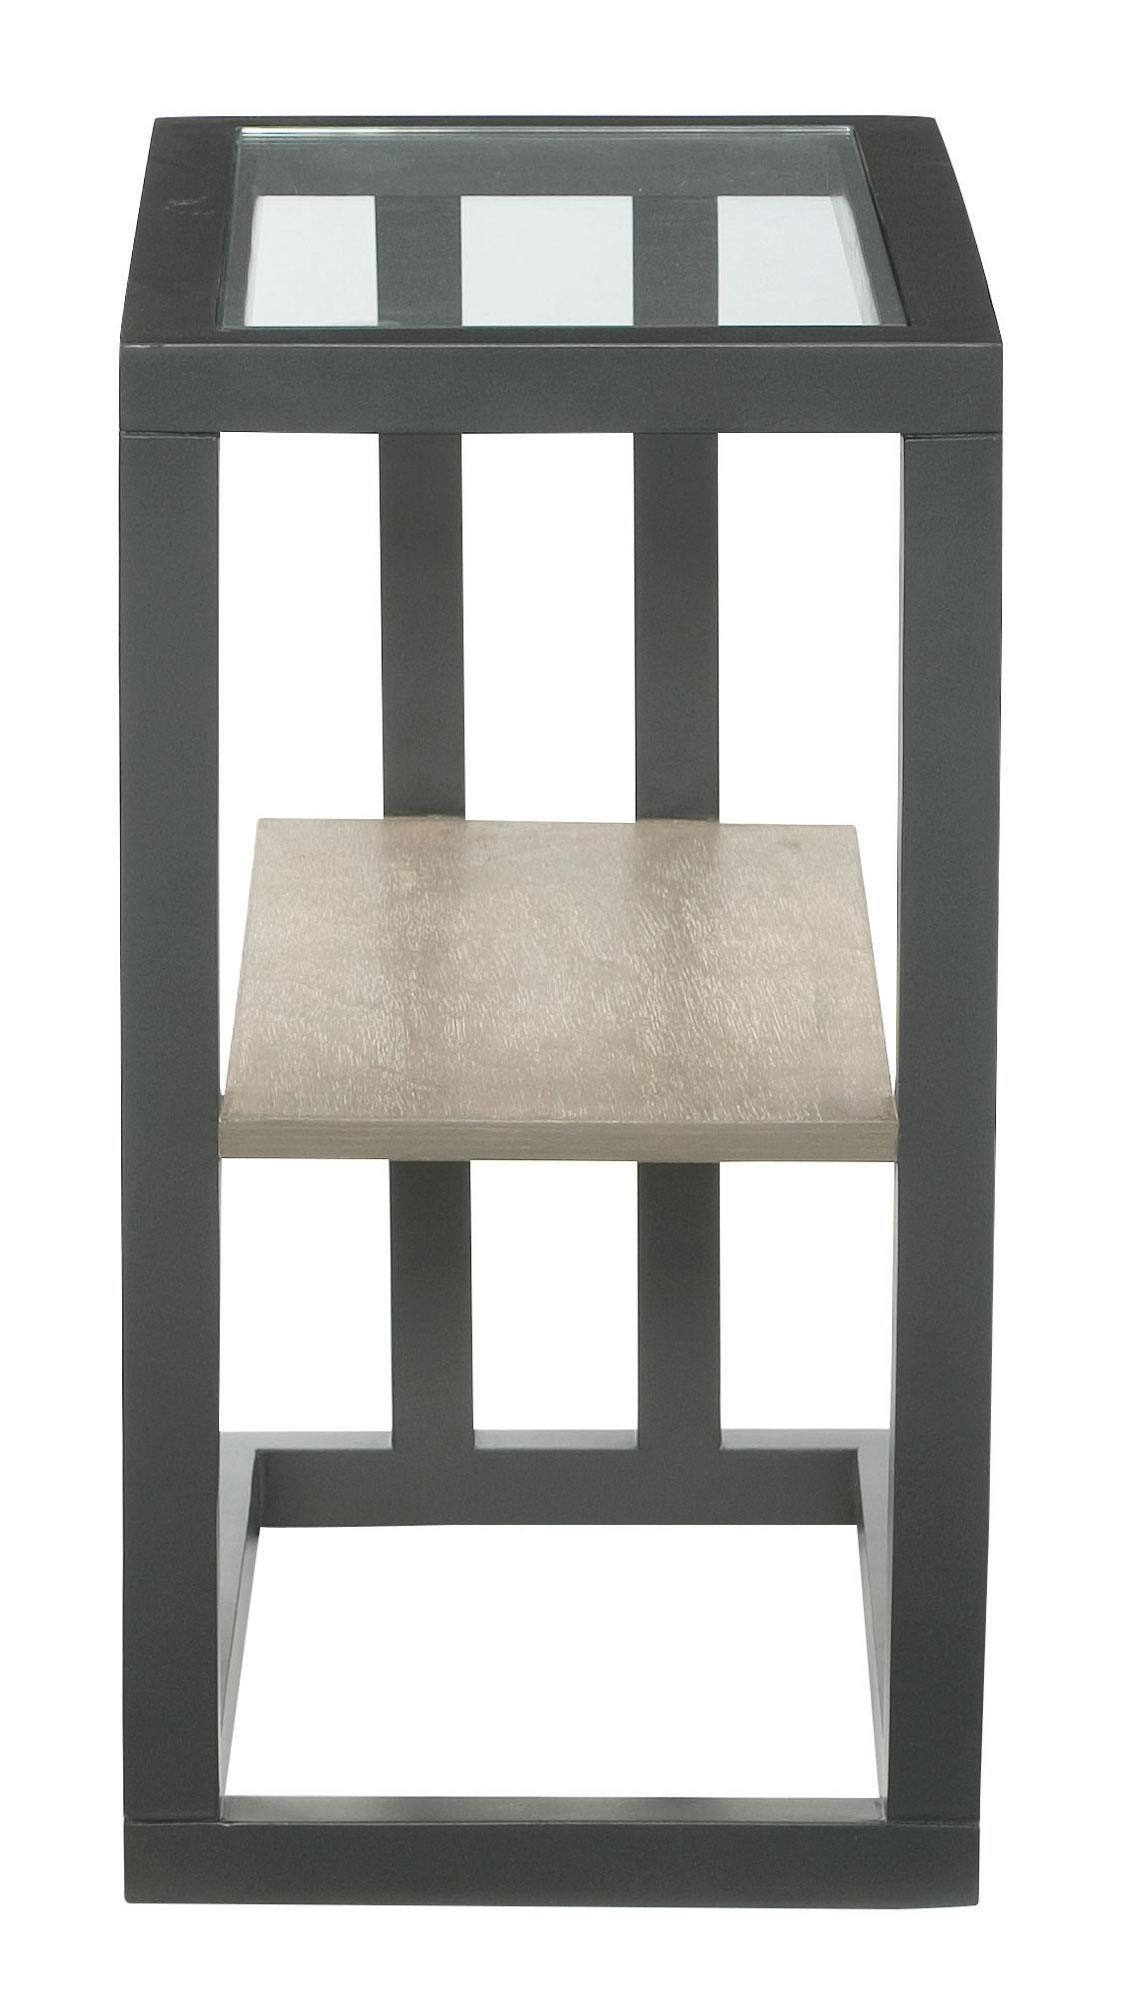 Bernhardt Wheeler Wheeler Chair Side Table - Item Number: 753784461